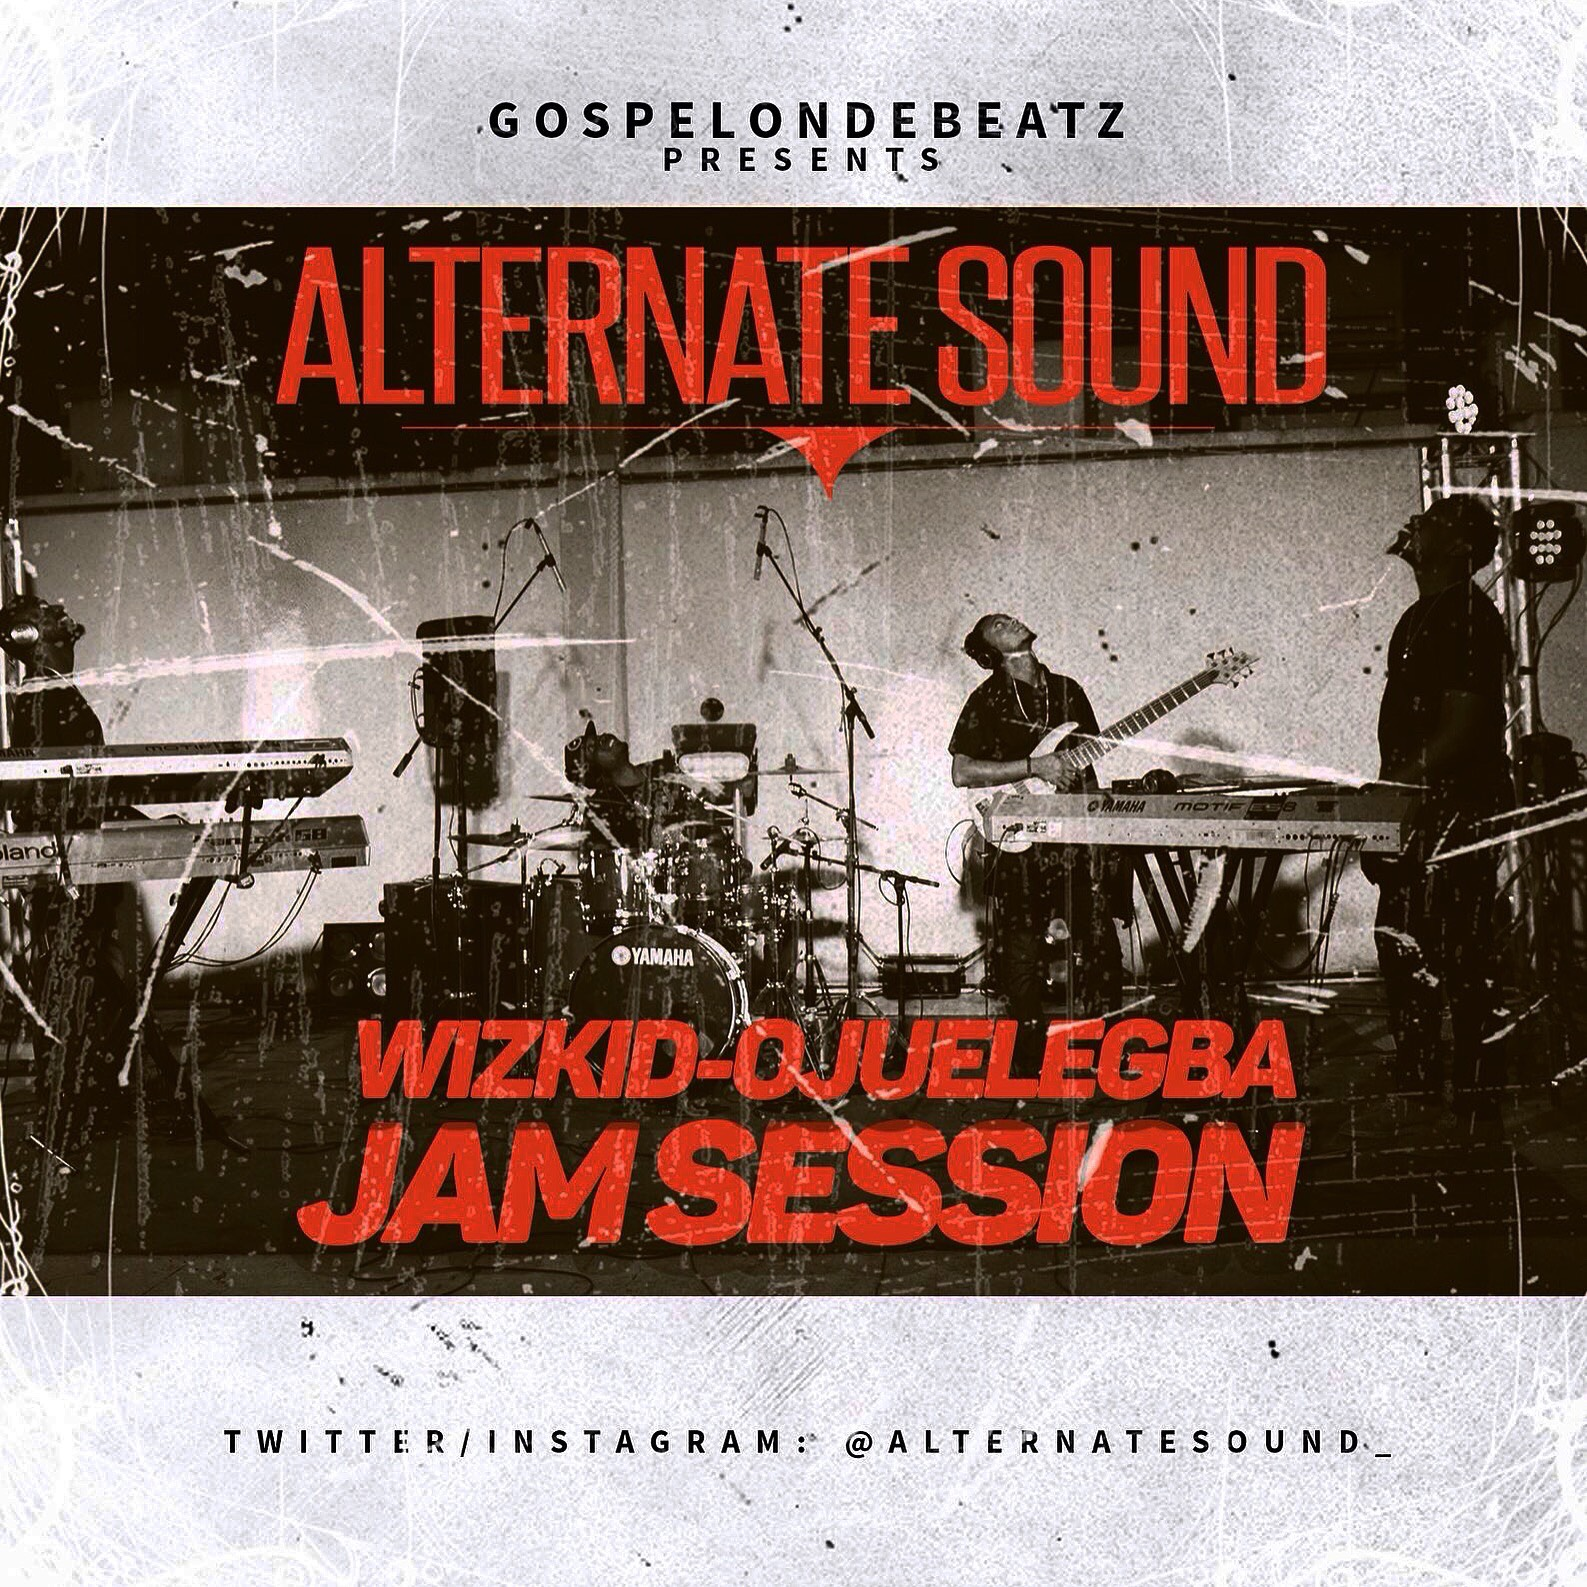 VIDEO: GospelOnDeBeatz x Alternate Sound x Wizkid - Ojuelegba (Live Jam Session)